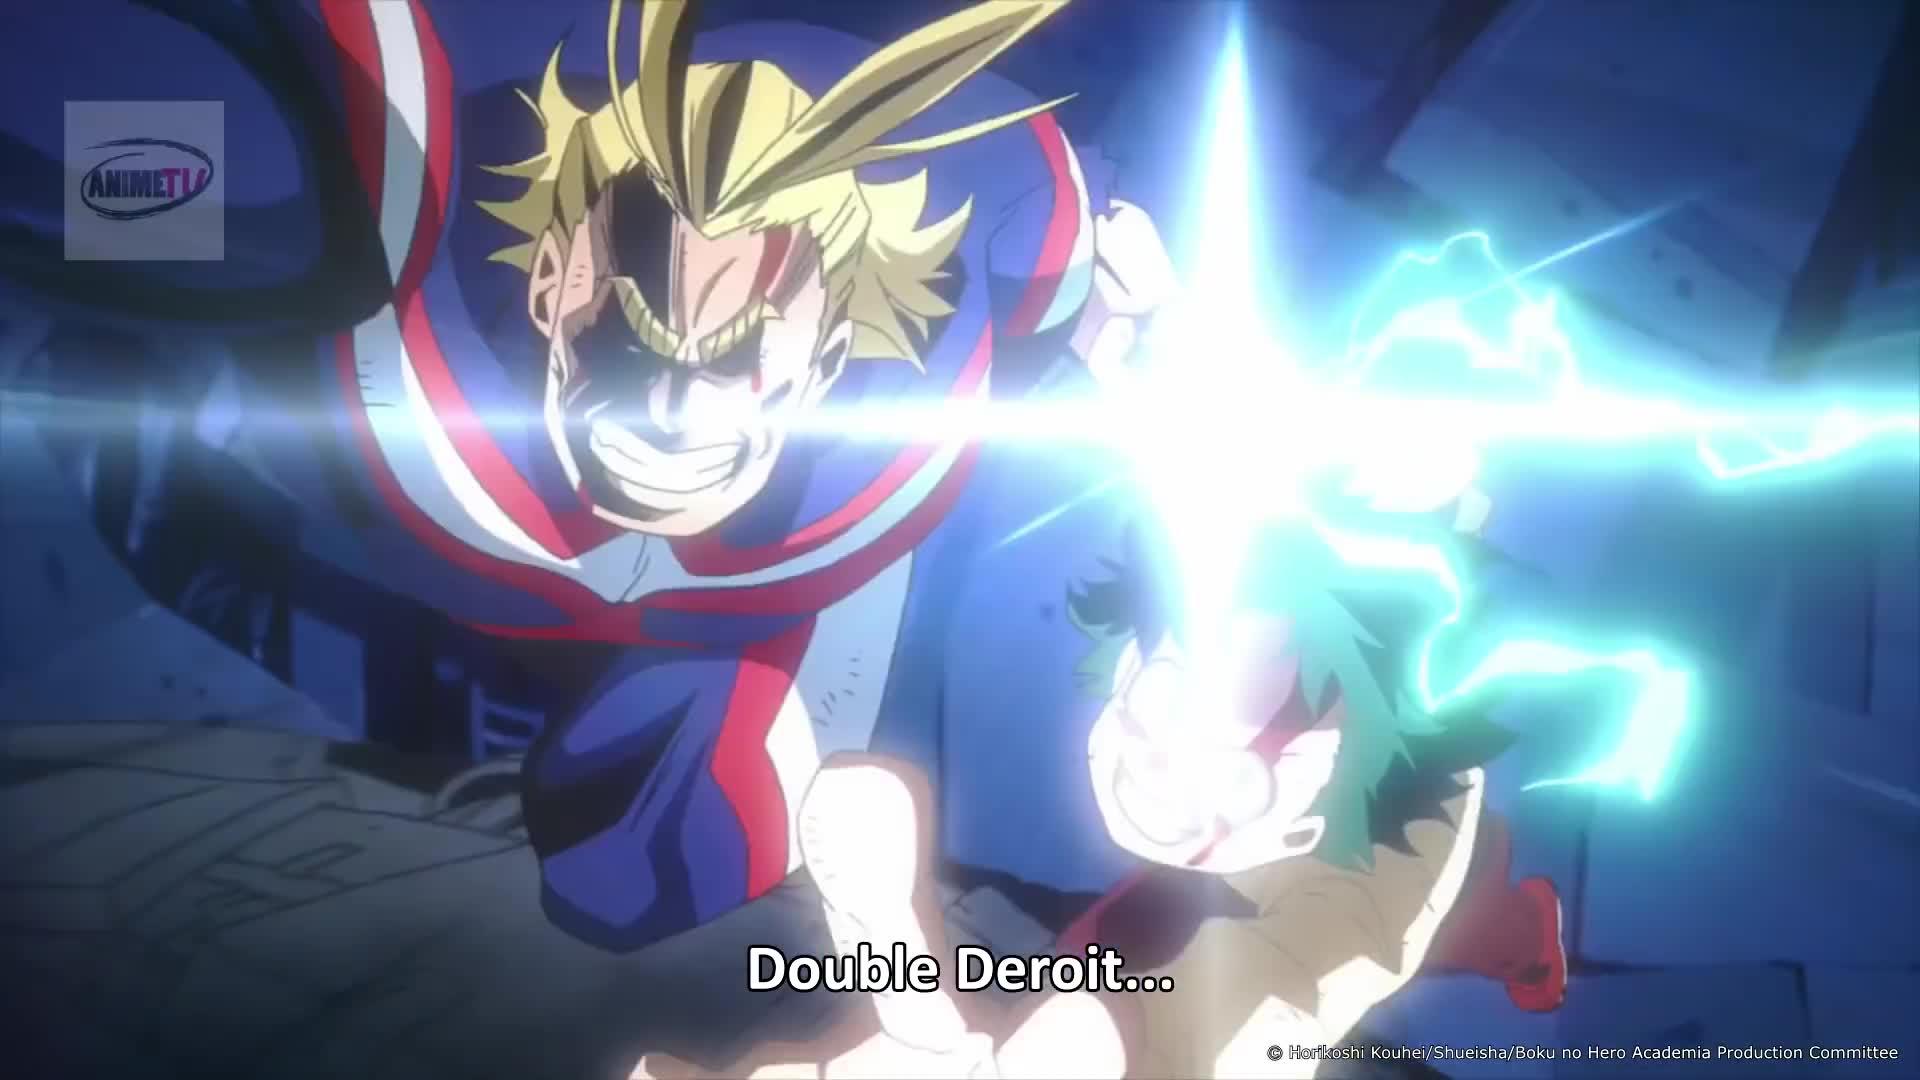 Double Detroit Smash My Hero Academia Two Heroes GIF by 1920x1080